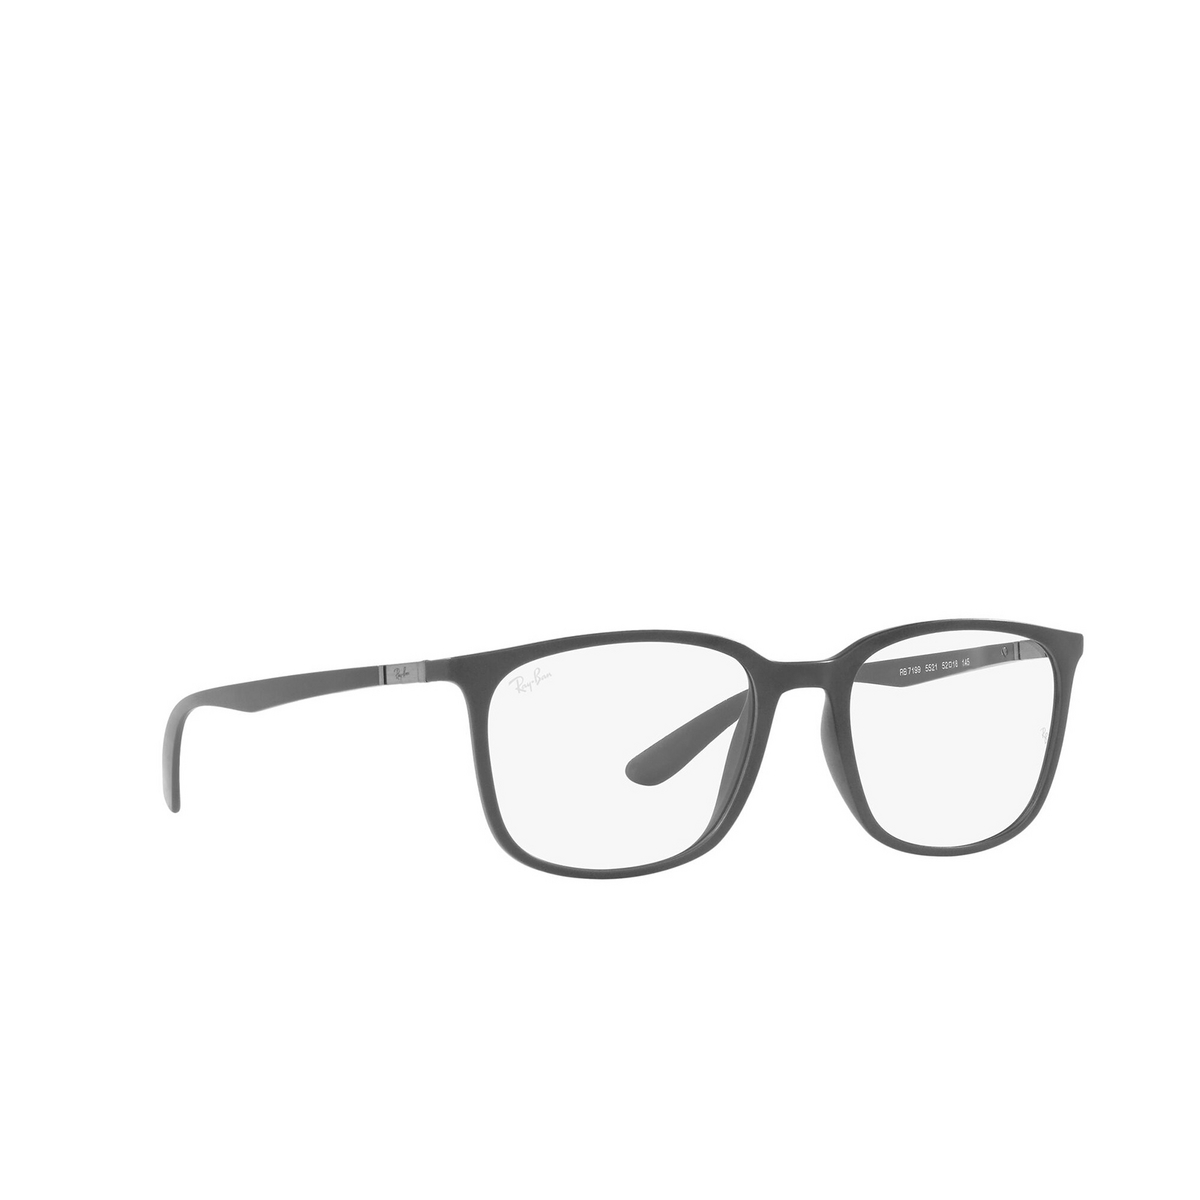 Ray-Ban® Square Eyeglasses: RX7199 color Sand Grey 5521 - three-quarters view.